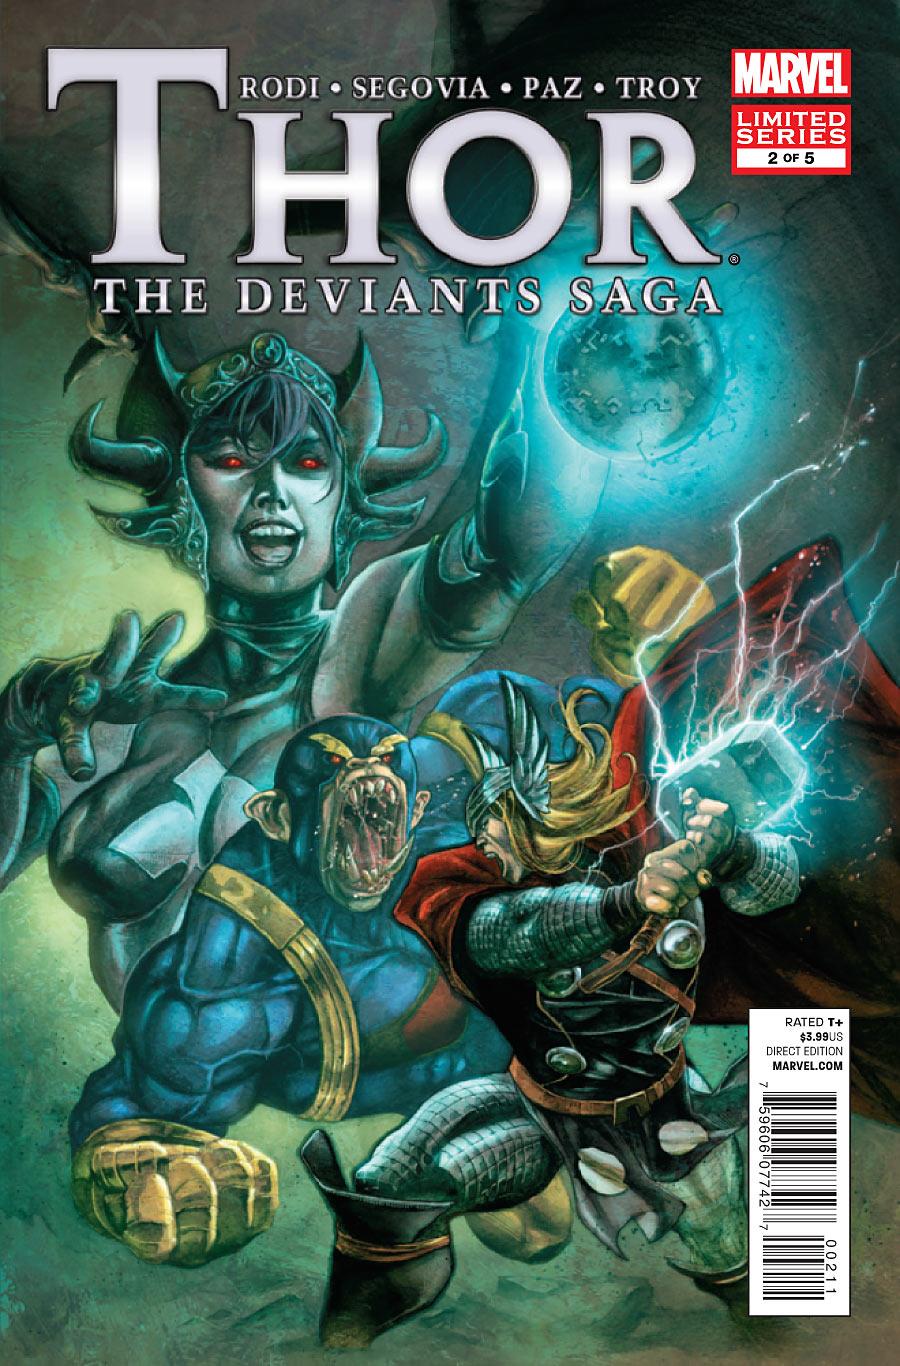 Thor The Deviants Saga Vol 1 2.jpg